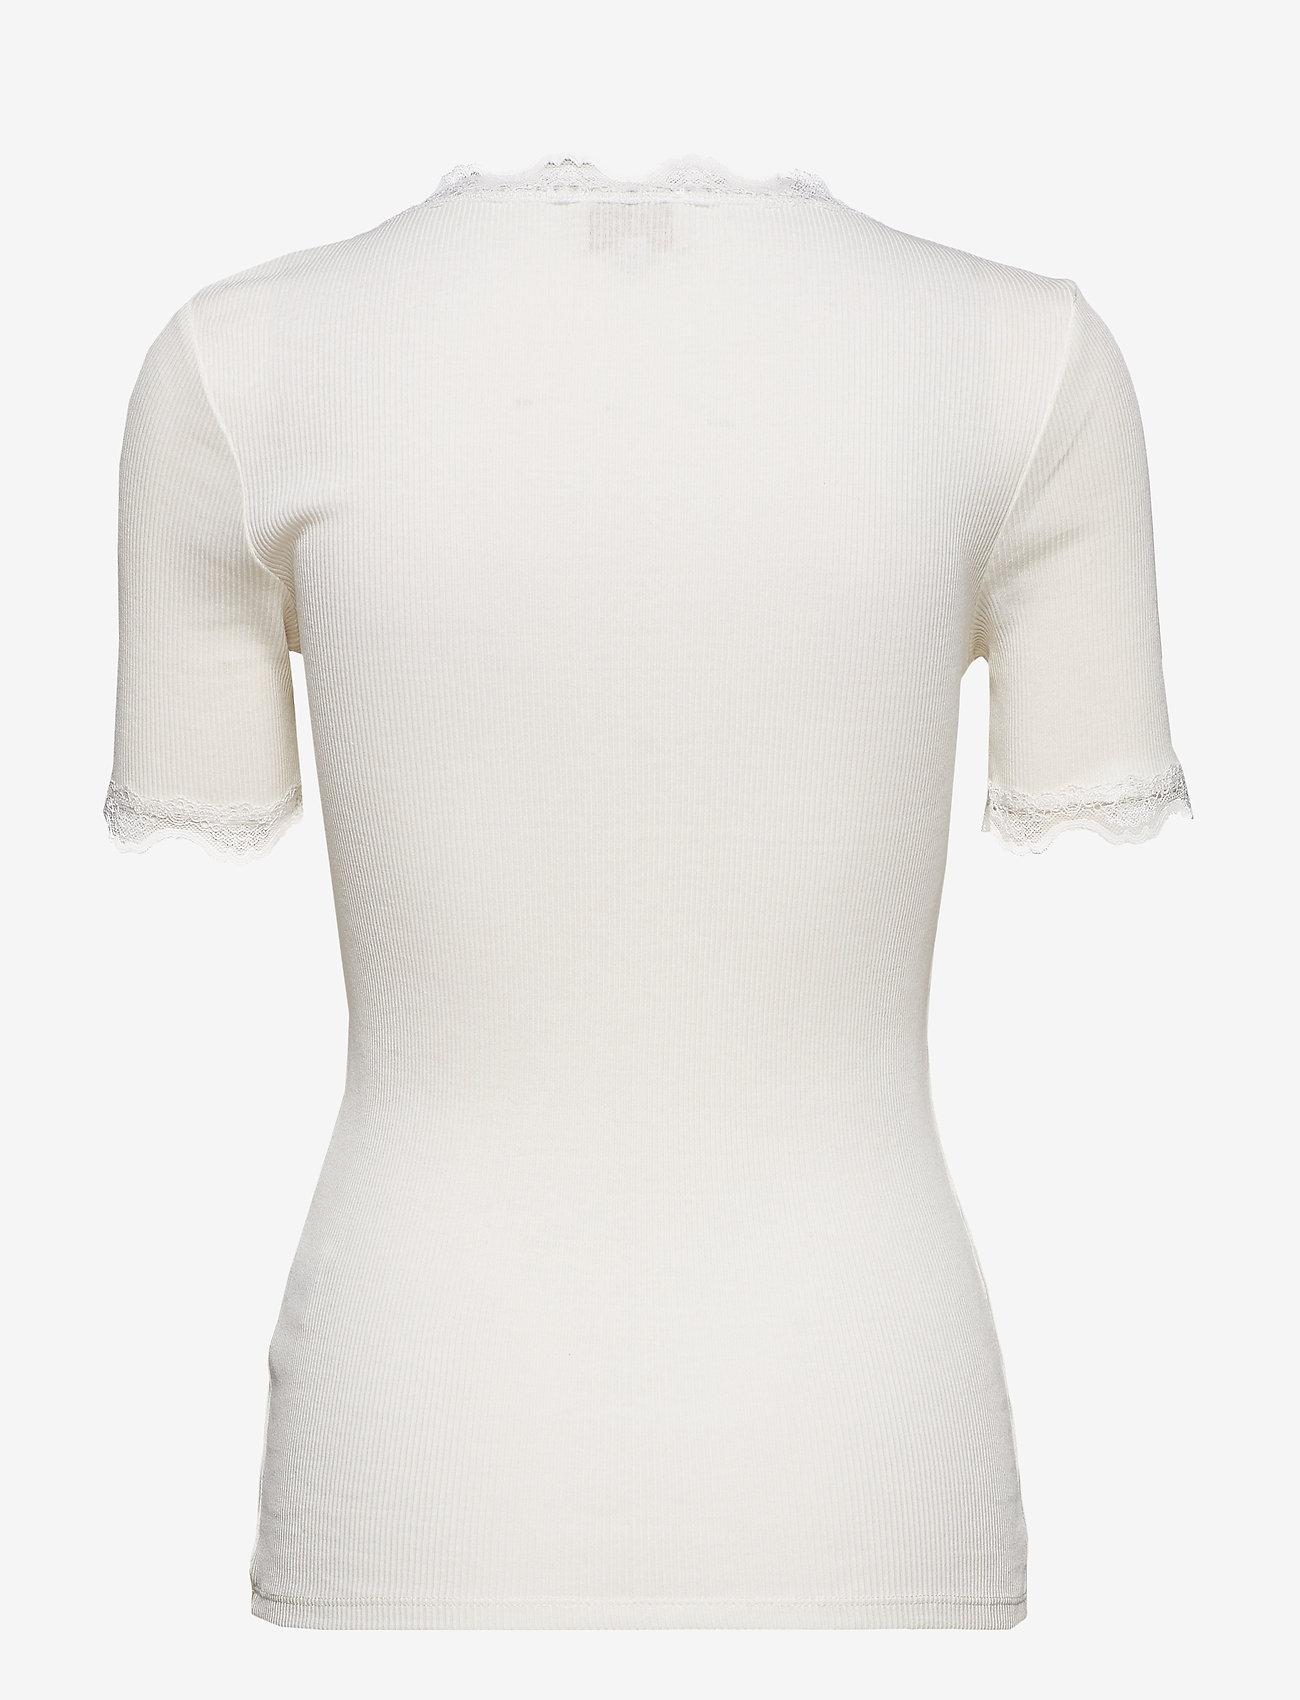 Minus - Ariel short sleeve - basic t-shirts - broken white - 1